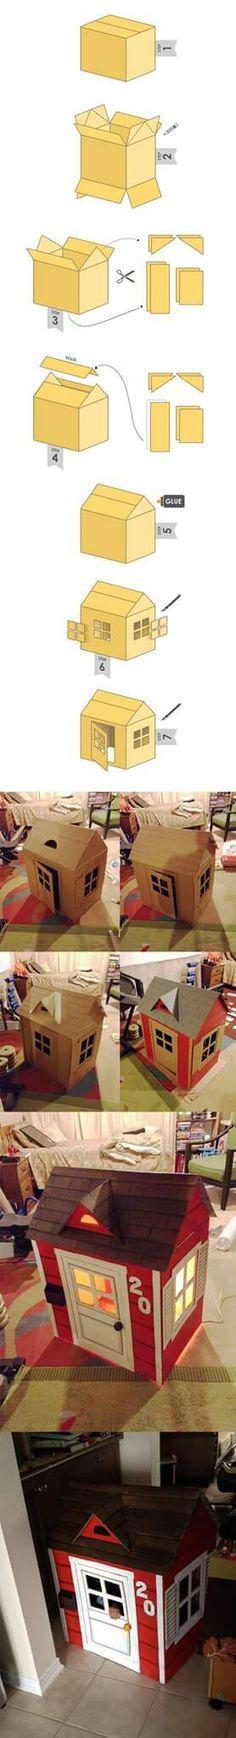 Ideas For Diy Box Carton Cardboard Playhouse Cardboard Box Houses, Cardboard Playhouse, Cardboard Toys, Cat Playhouse, Cardboard Dollhouse, Playhouse Ideas, Cardboard Furniture, Woodworking Furniture, Furniture Plans